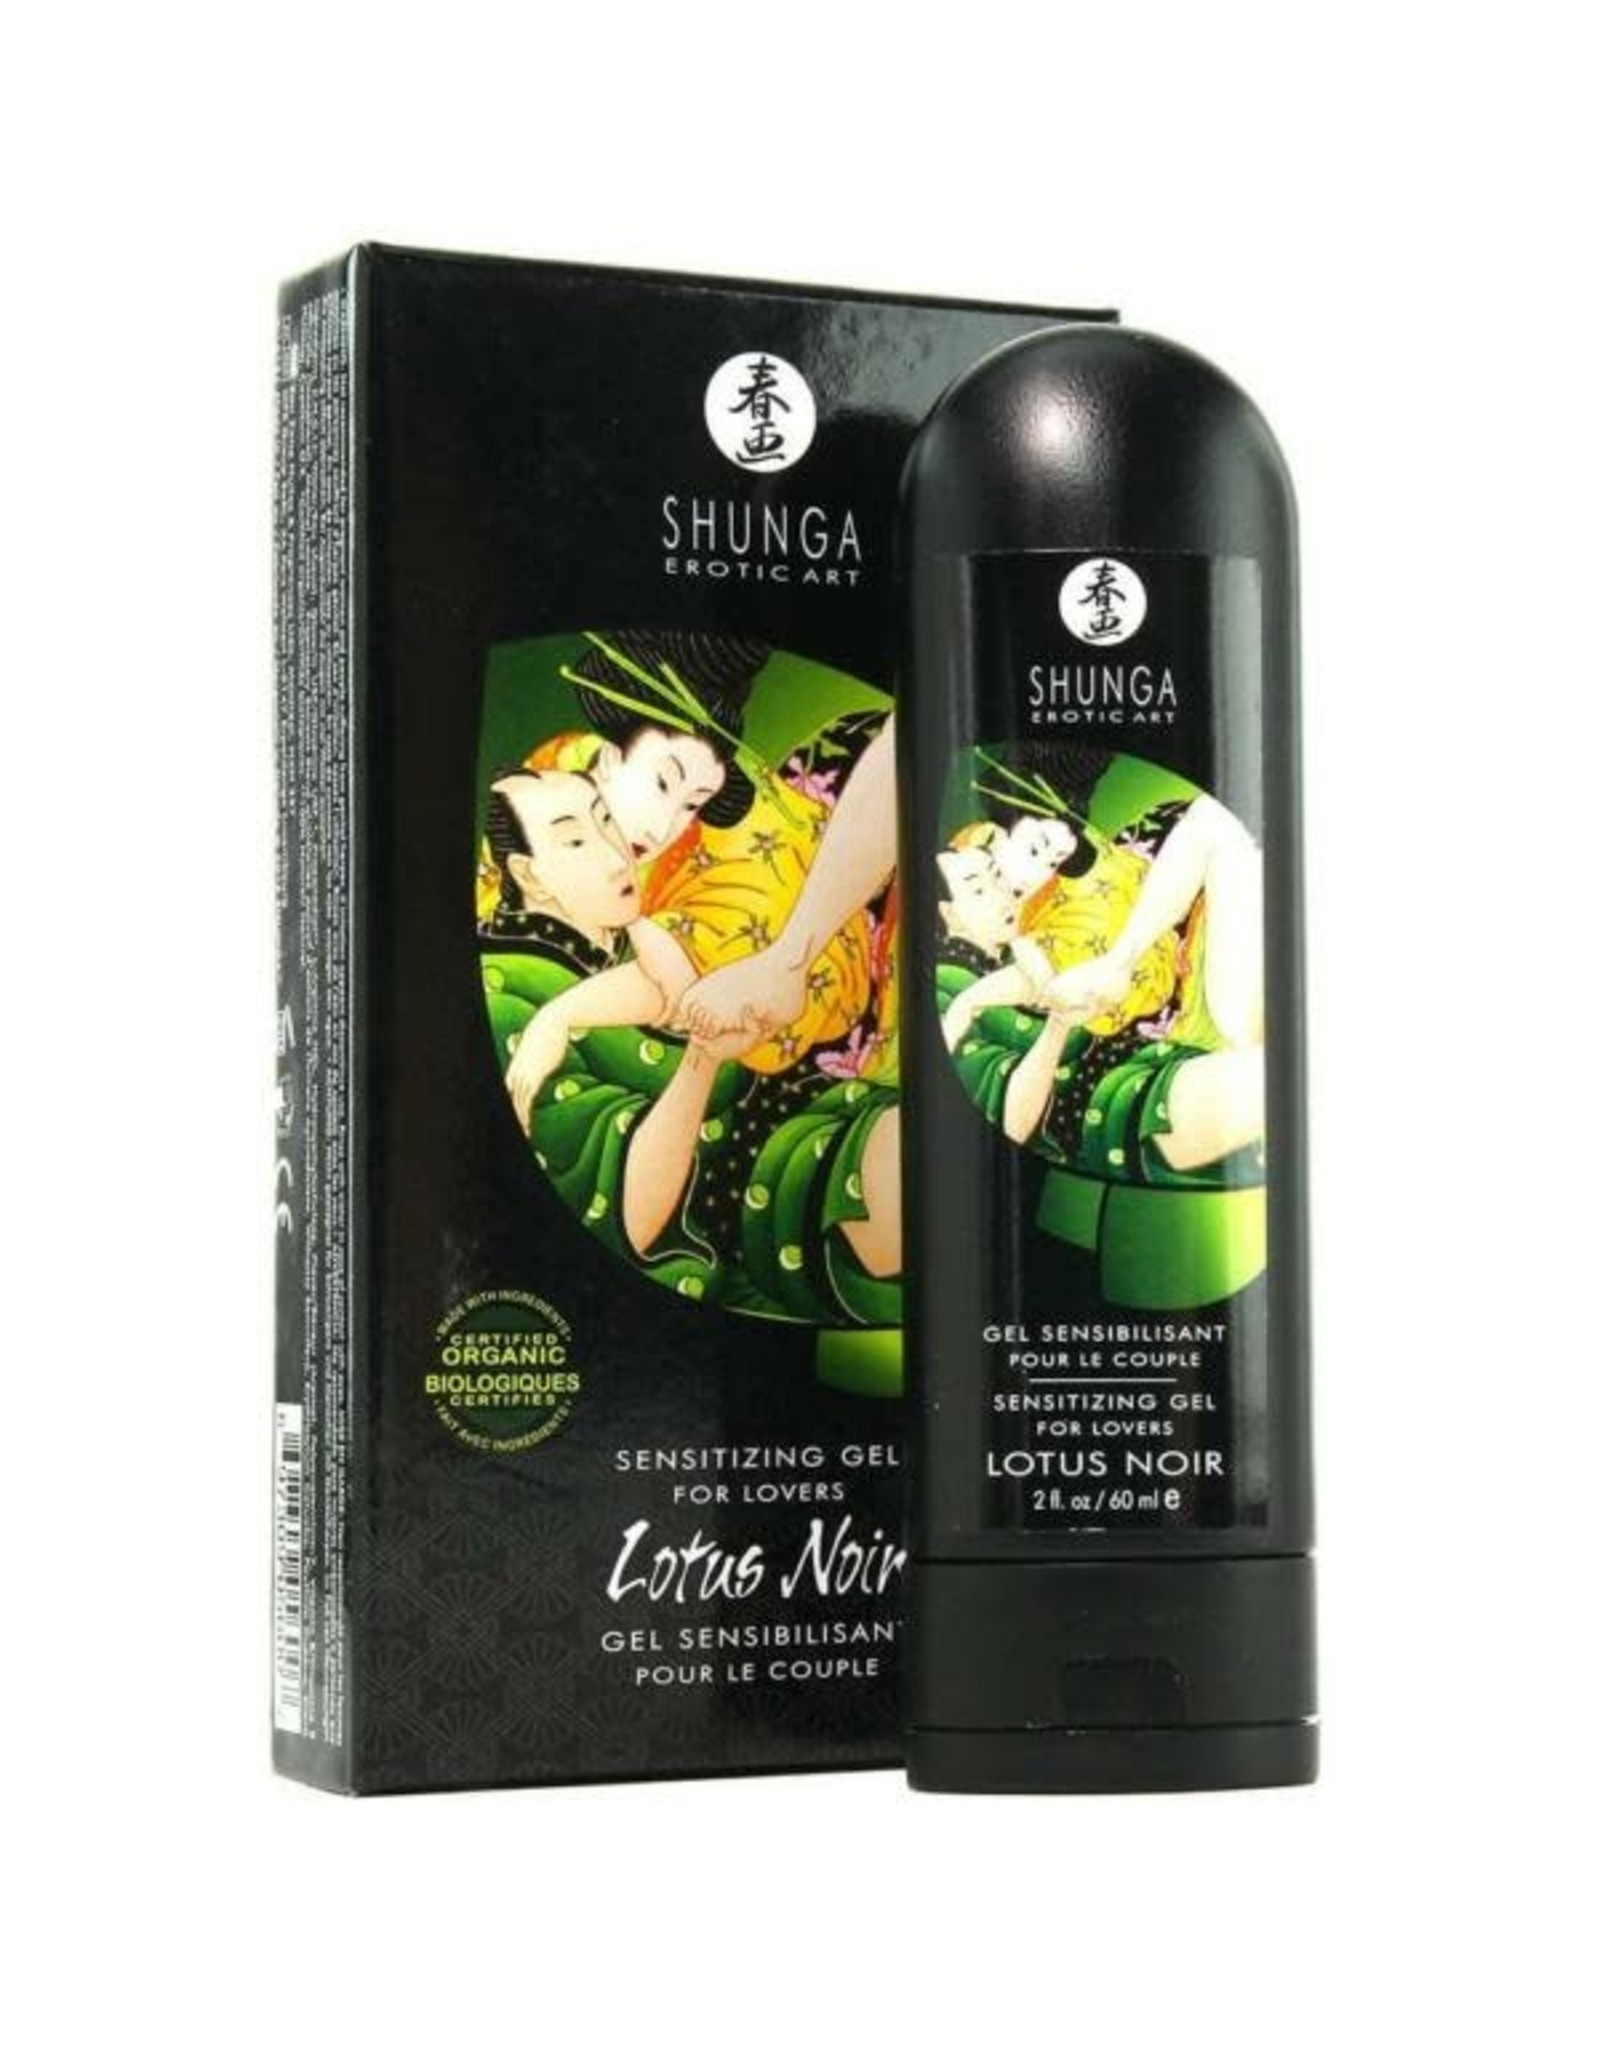 Shunga Shunga - Lotus Noir - Sensitizing Gel for Lovers 2oz/60ml